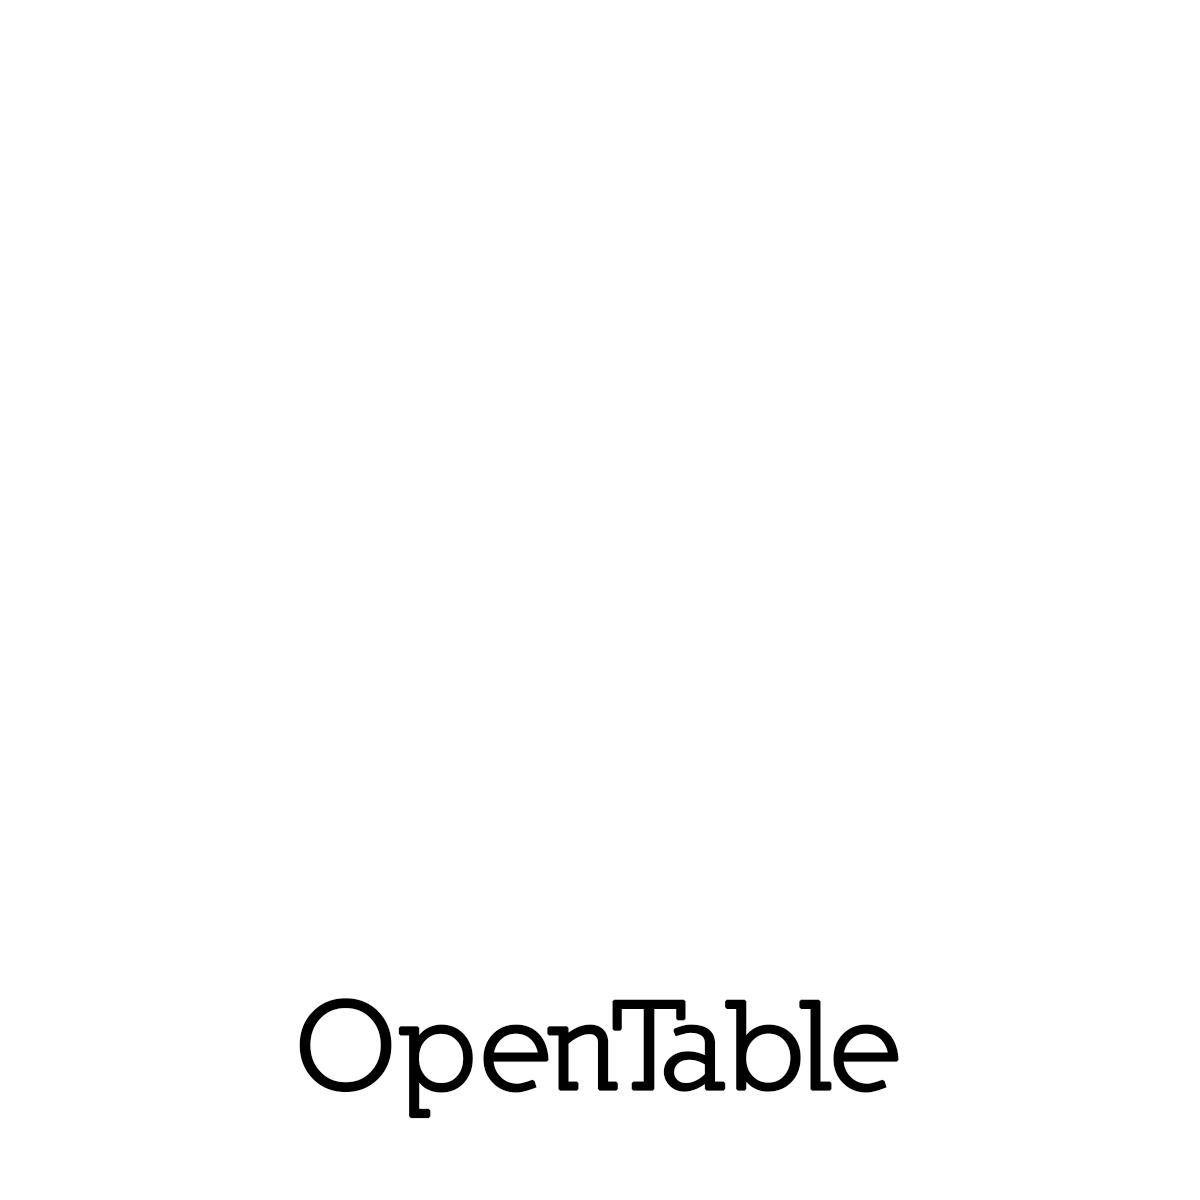 opentable_resized-web.jpg